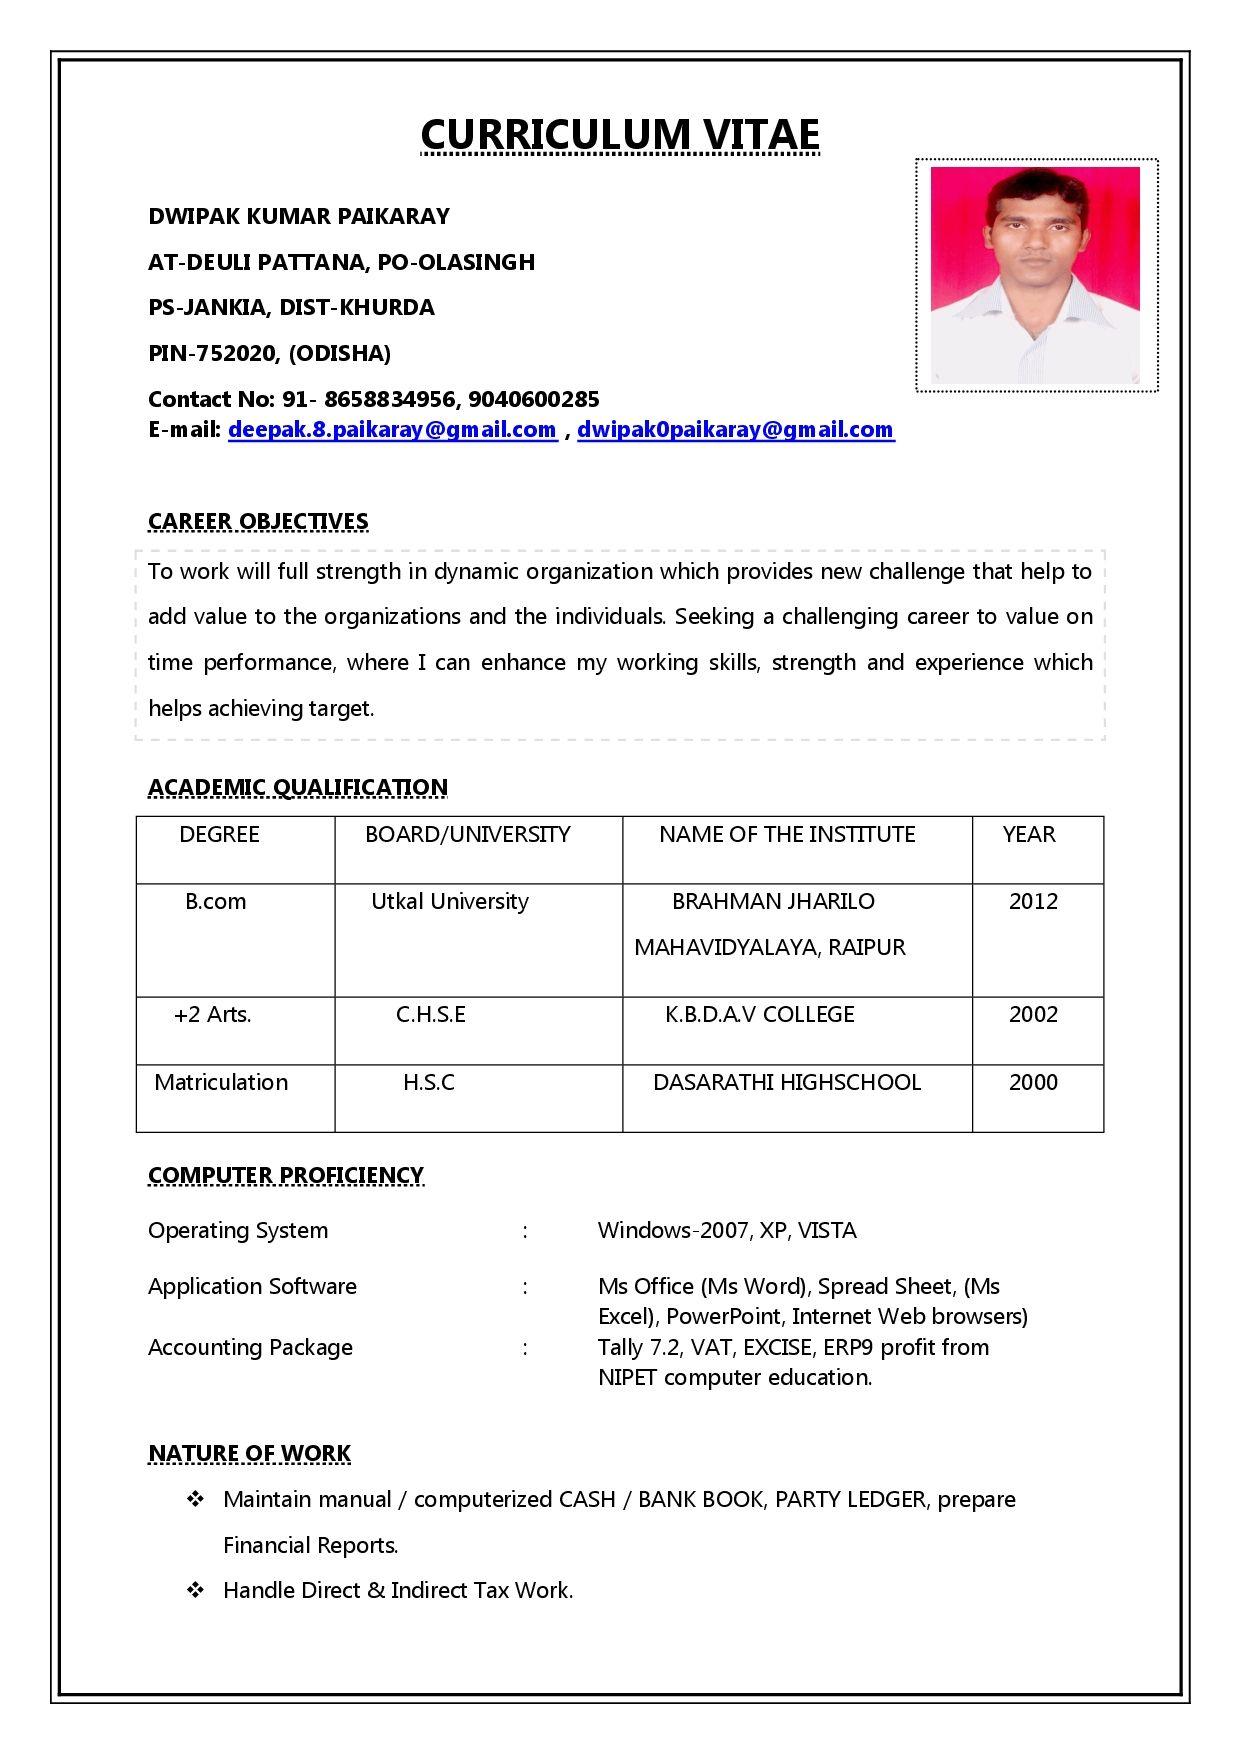 Resume Format Job Interview Job resume format, Job